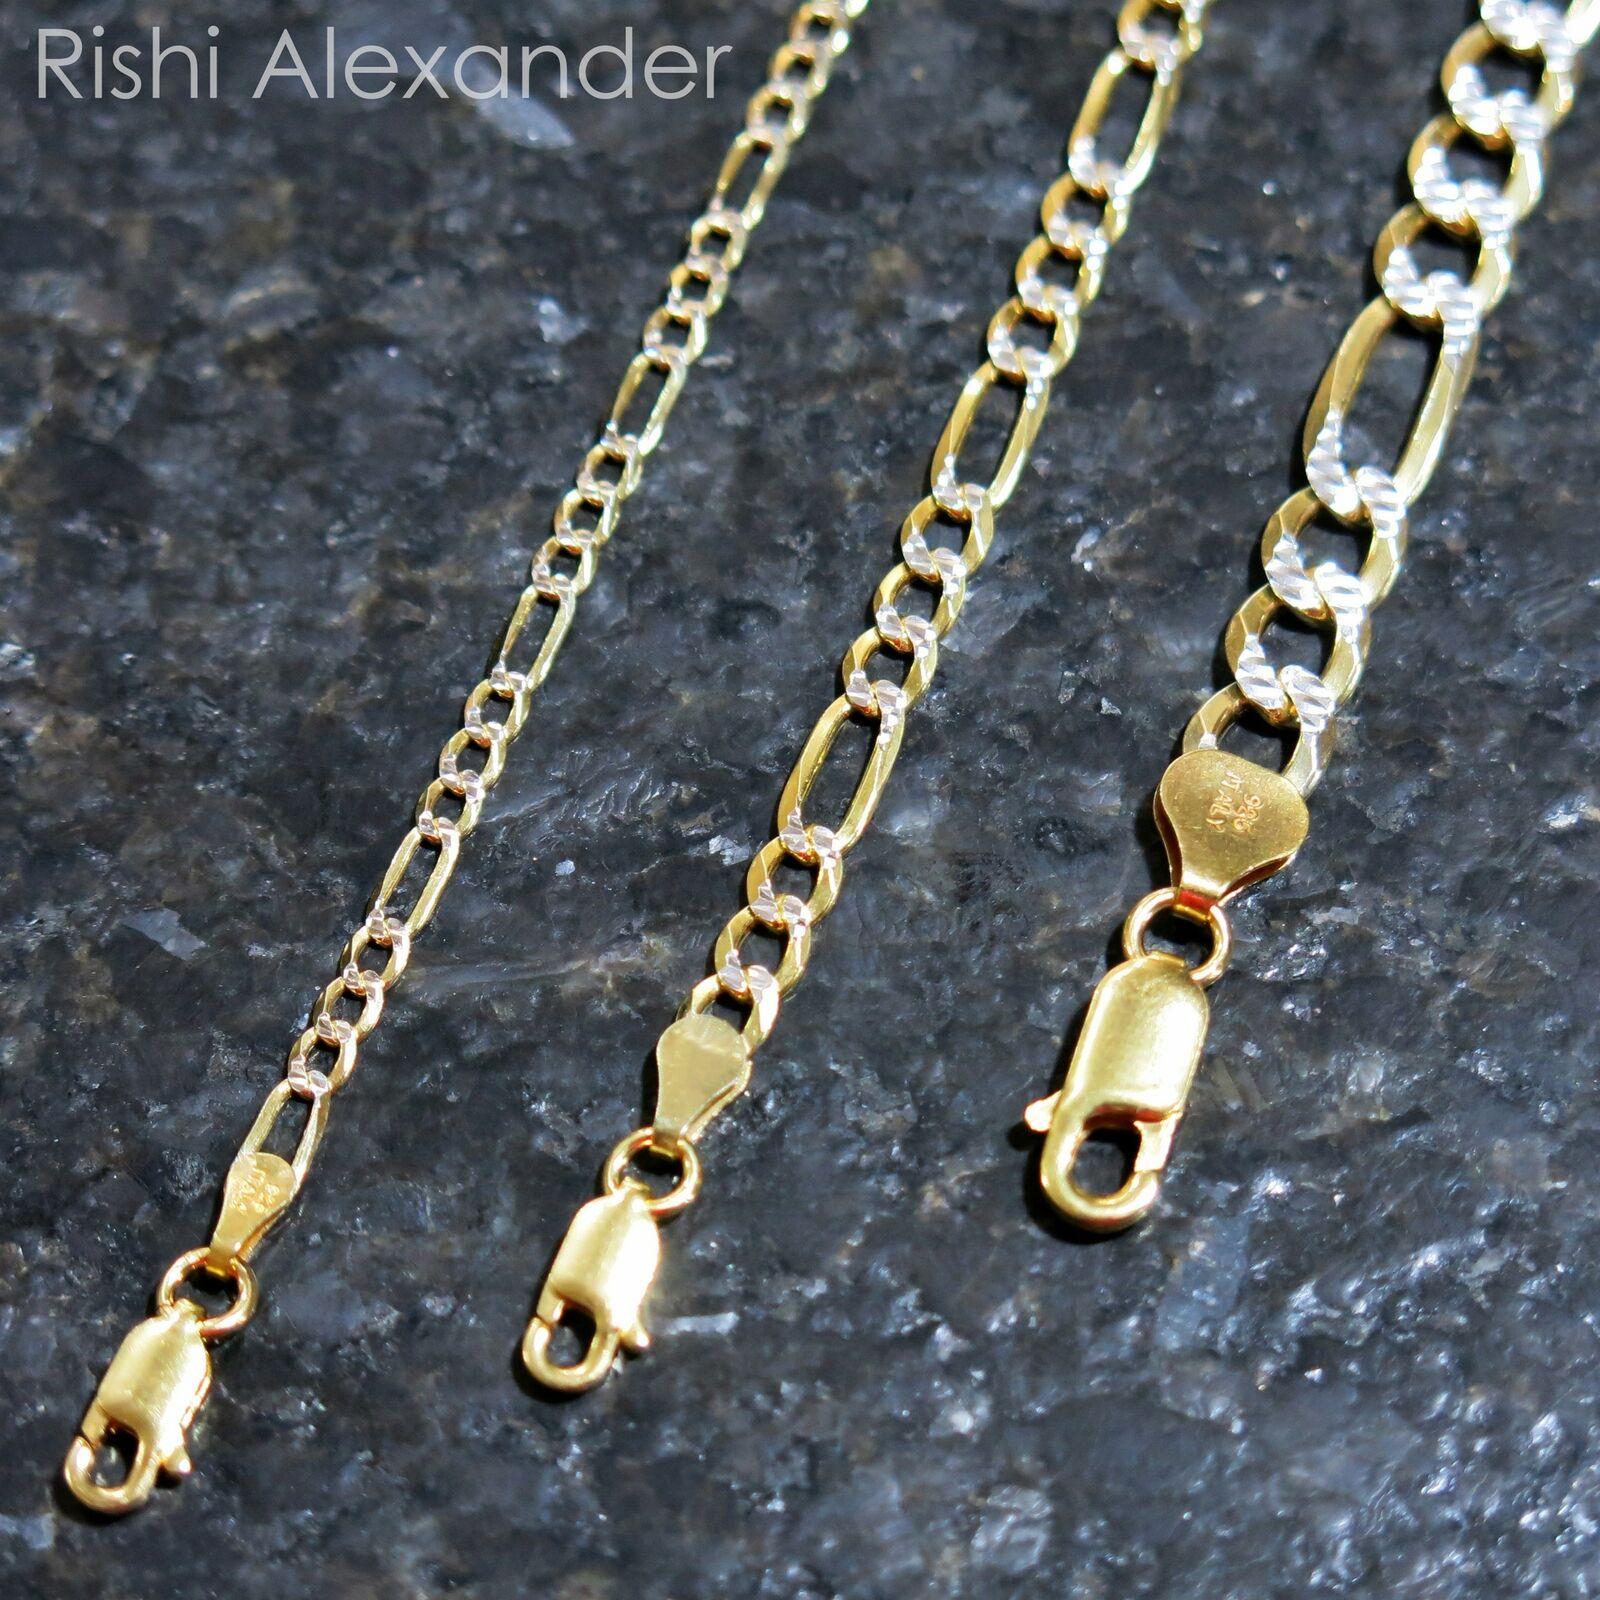 14k Gold over Sterling Silver Pave Diamond Cut Figaro Mens Bracelet or Necklace